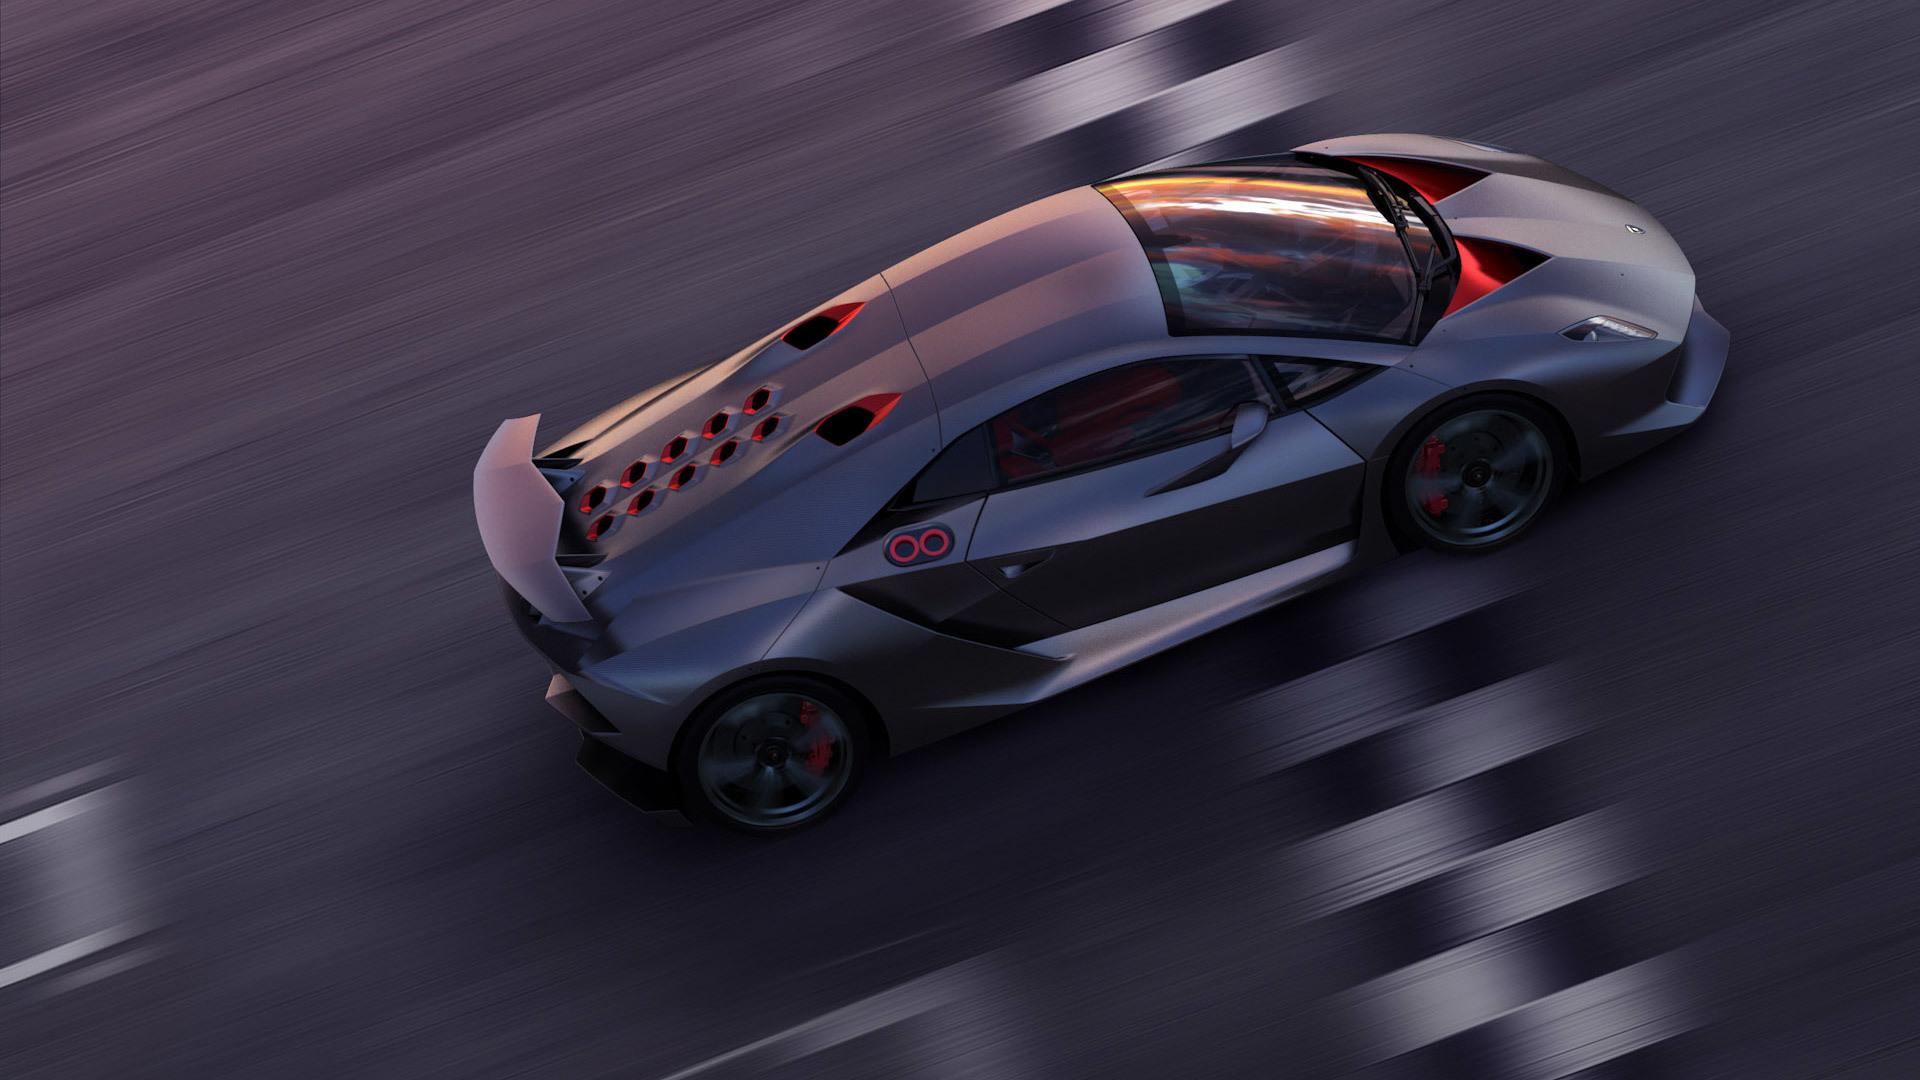 Wallpaper Car Vehicle Lamborghini Sesto Elemento Sesto Elemento